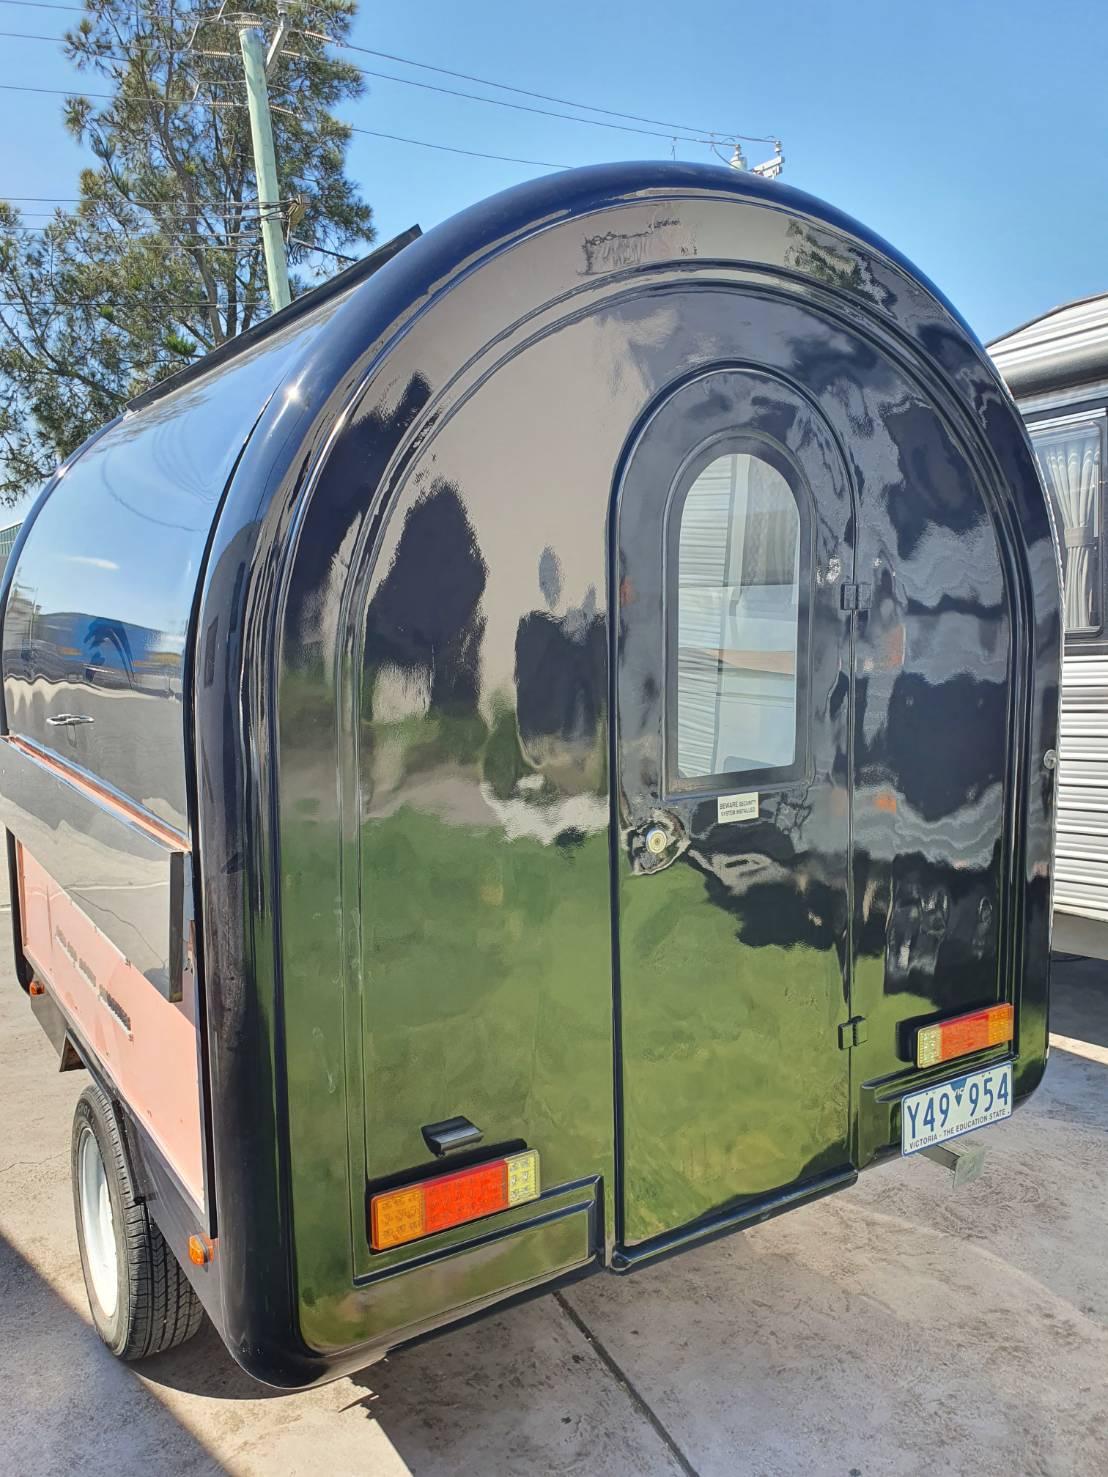 Food van all shiny and ready to impress